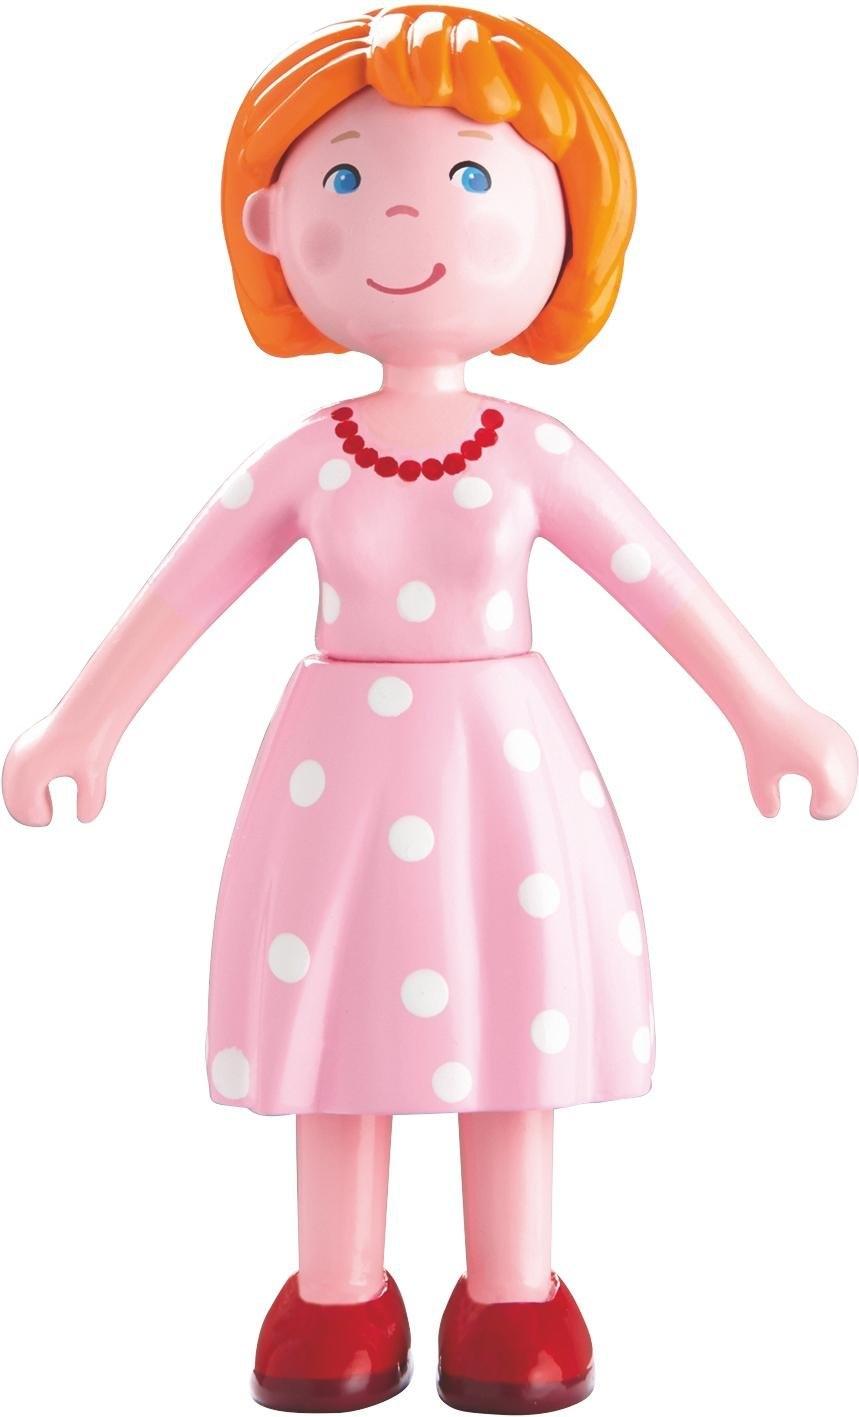 Haba pop Little Friends - mama Katrin (1-delig) nu online kopen bij OTTO